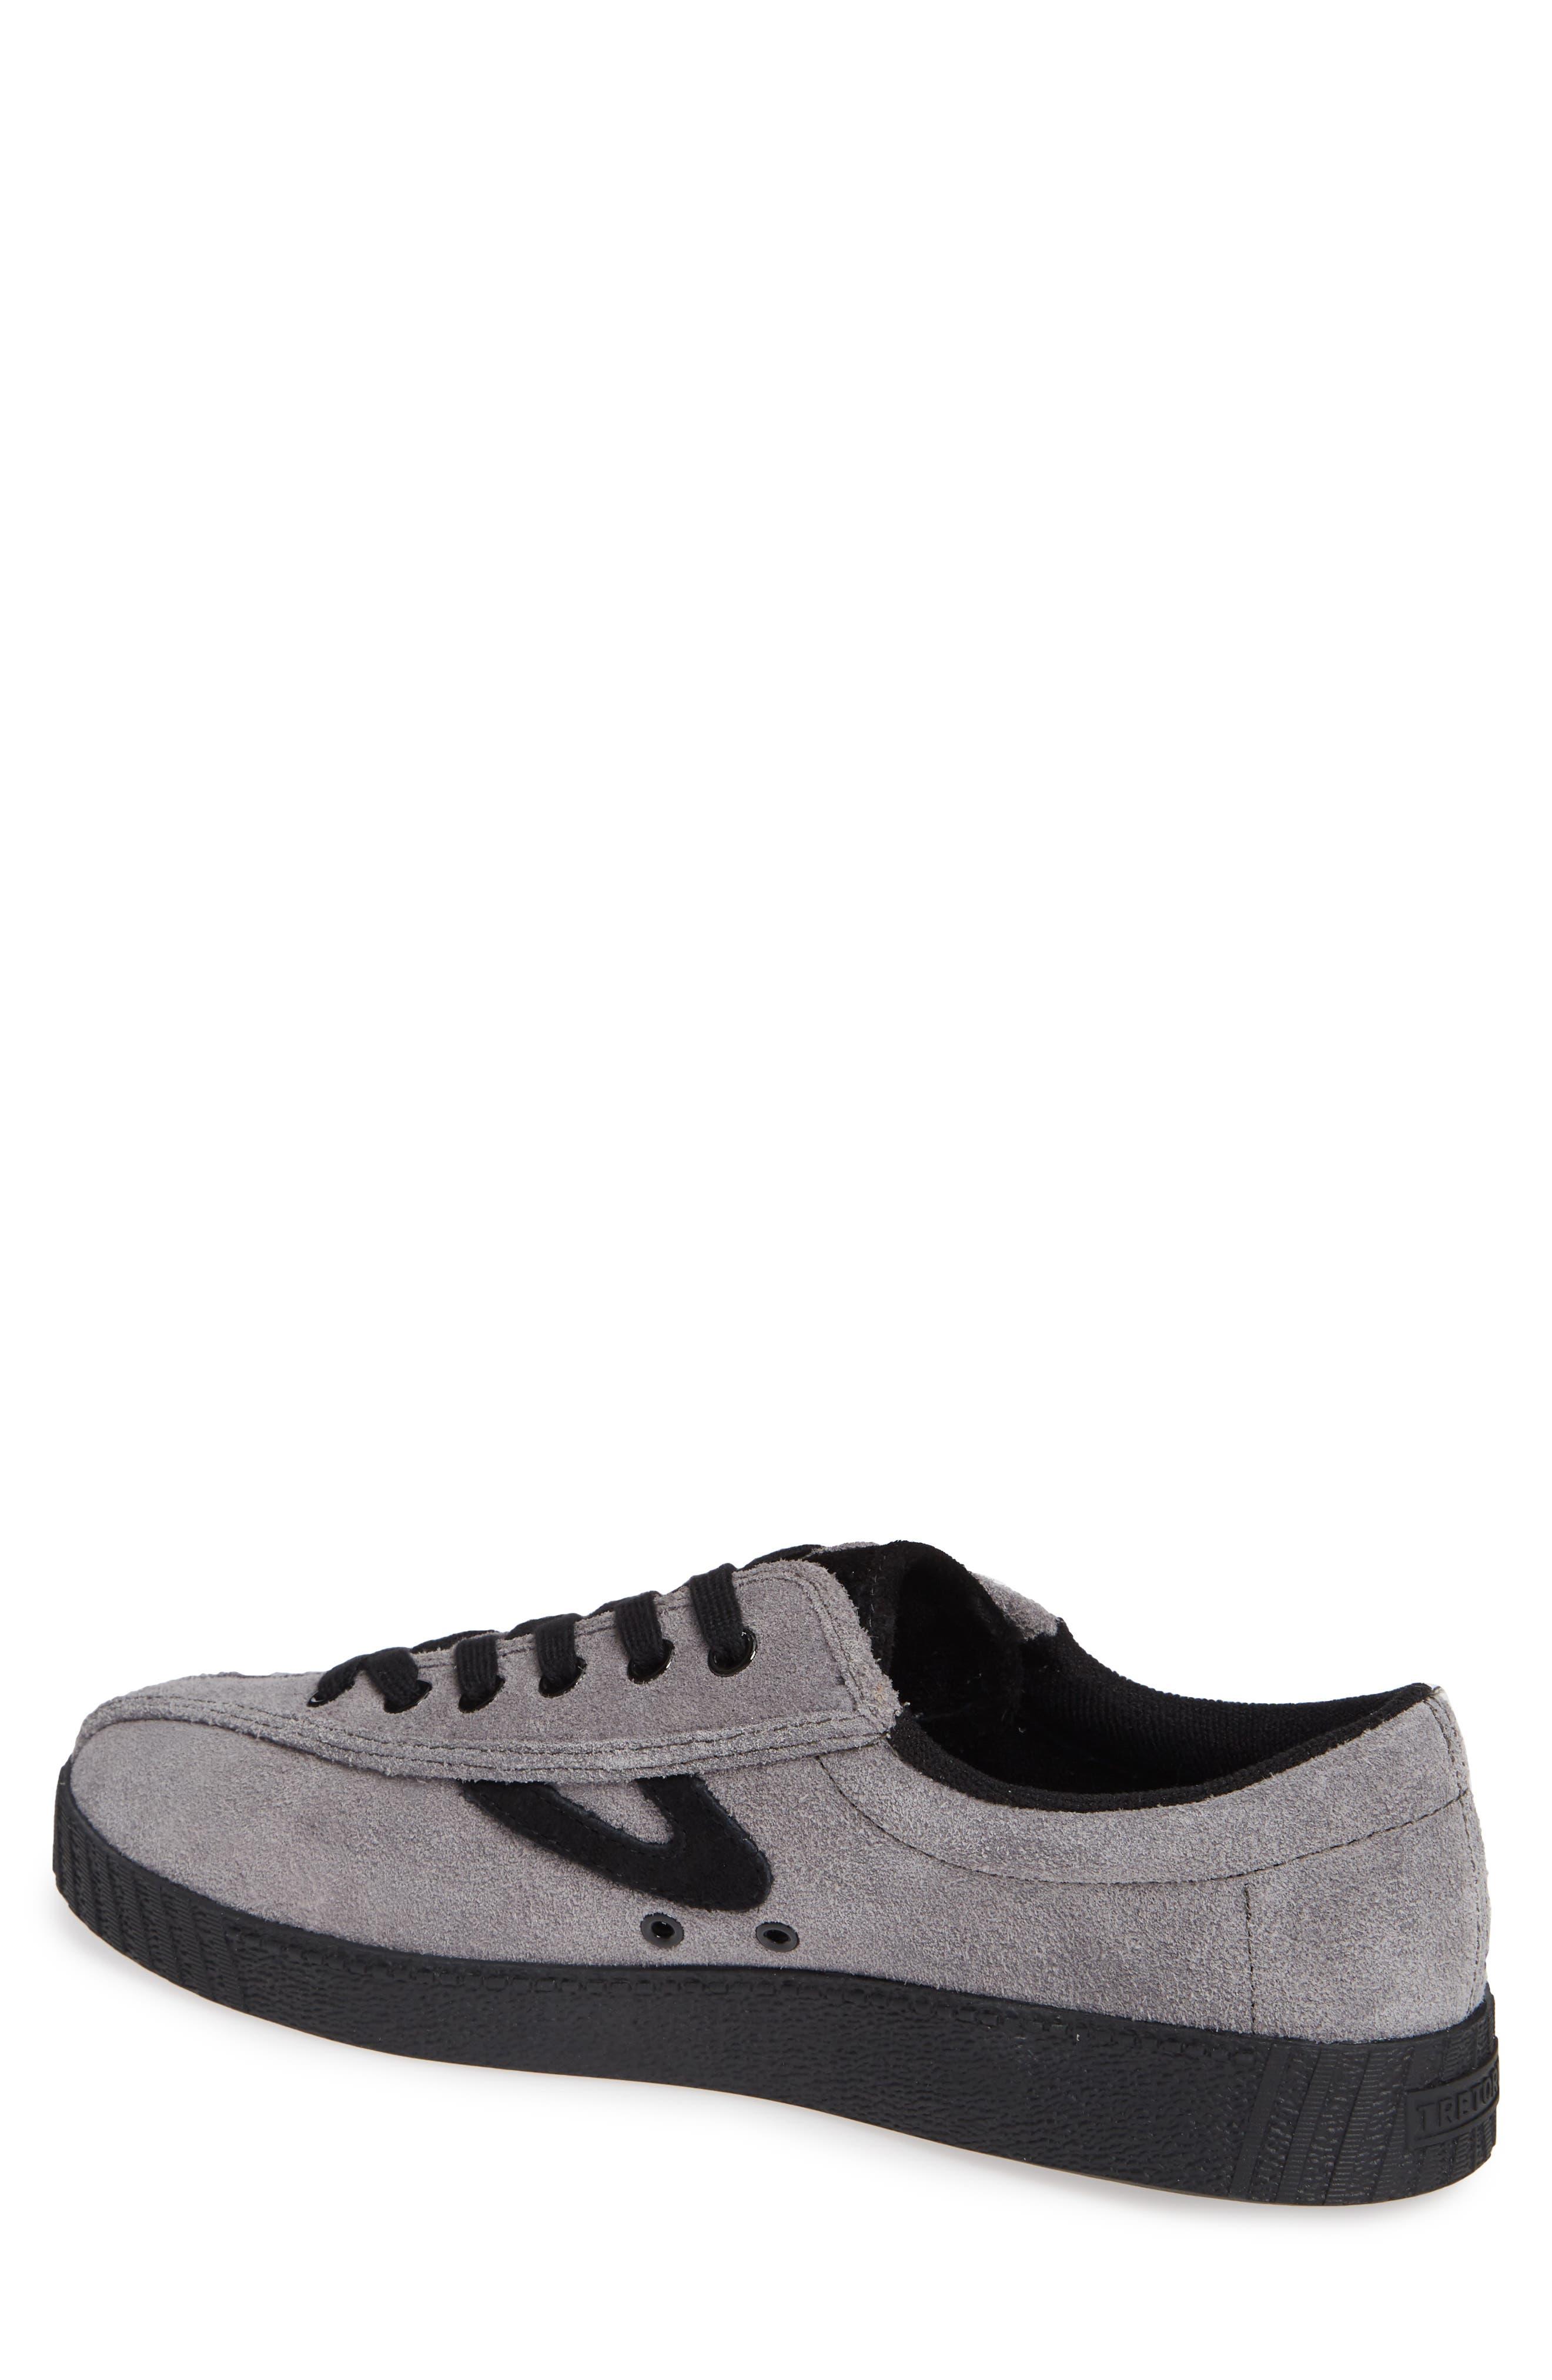 Nylite26Plus Sneaker,                             Alternate thumbnail 2, color,                             GRAPHITE SUEDE